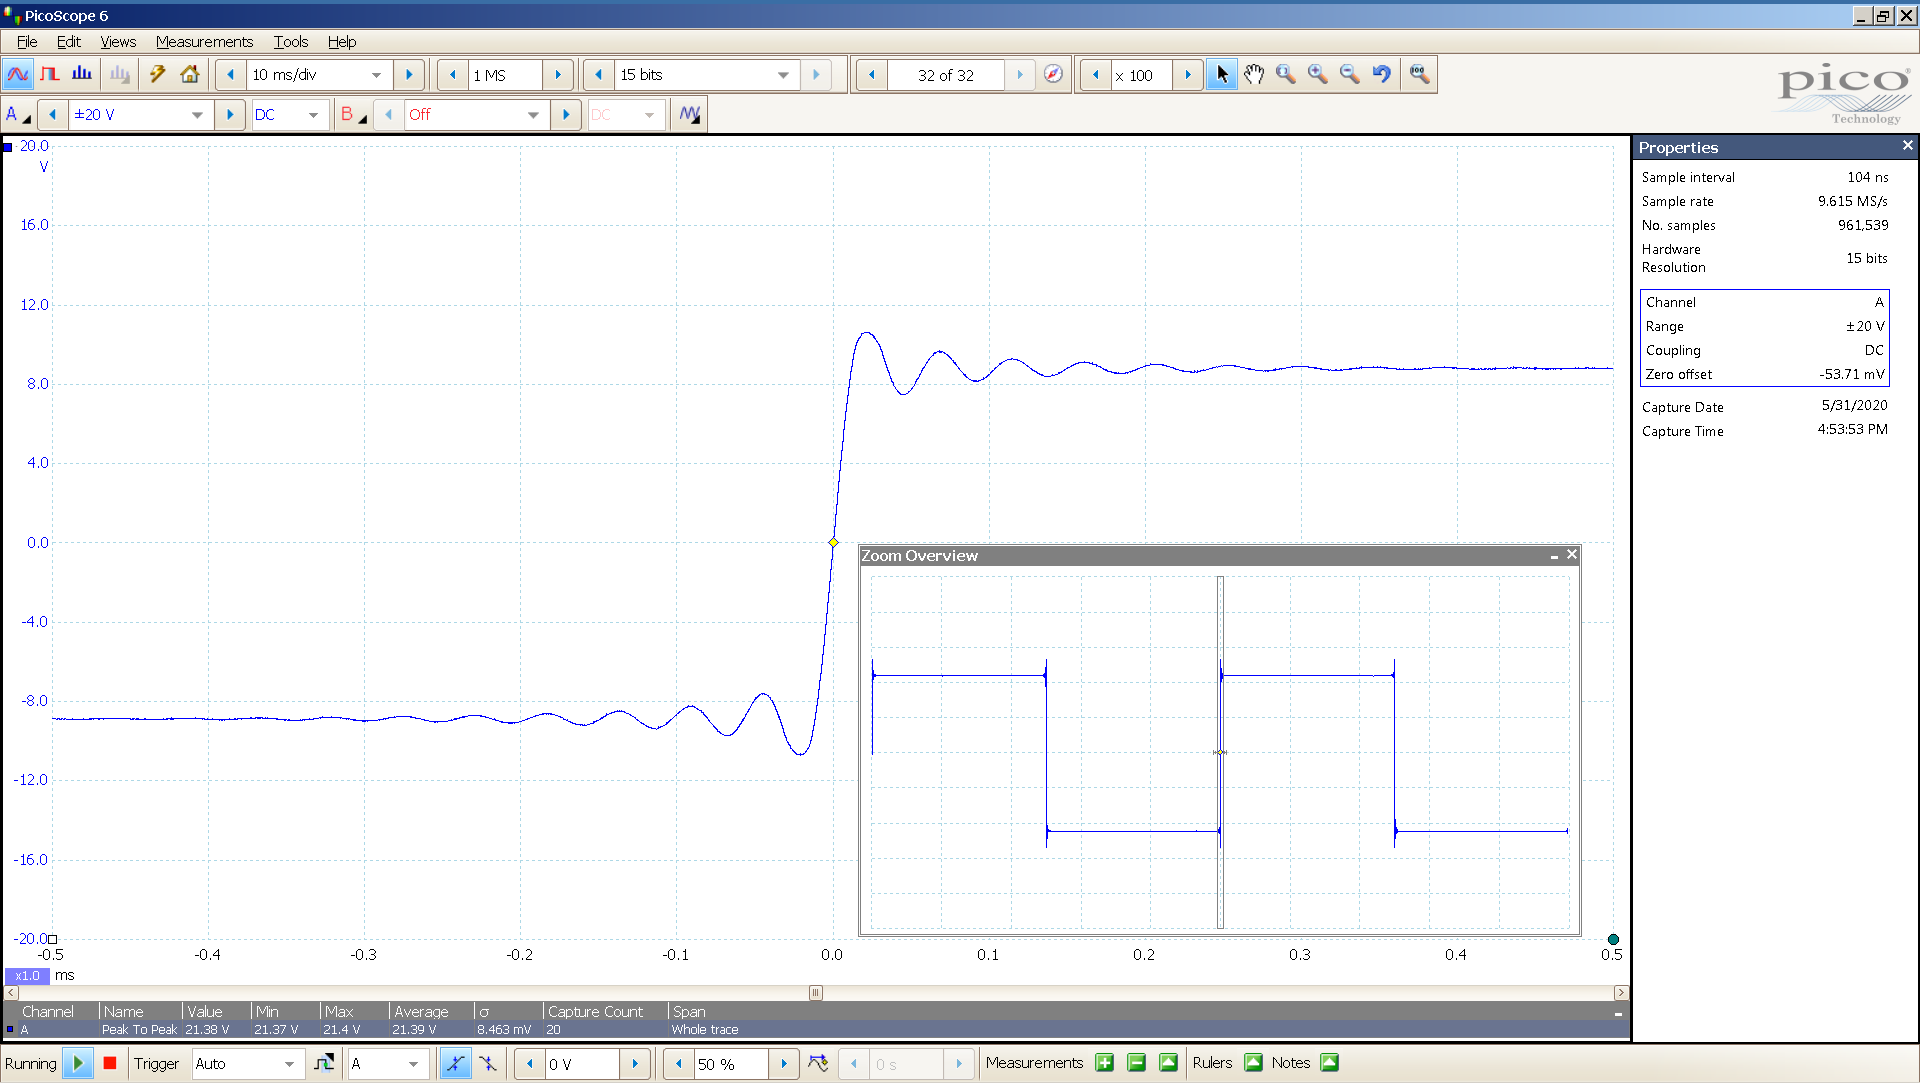 20200531-21 UltraLite-mk4 20 Hz sqr -1 dBFS 17_8 Vpp 100uS div - spdif BAL.PNG